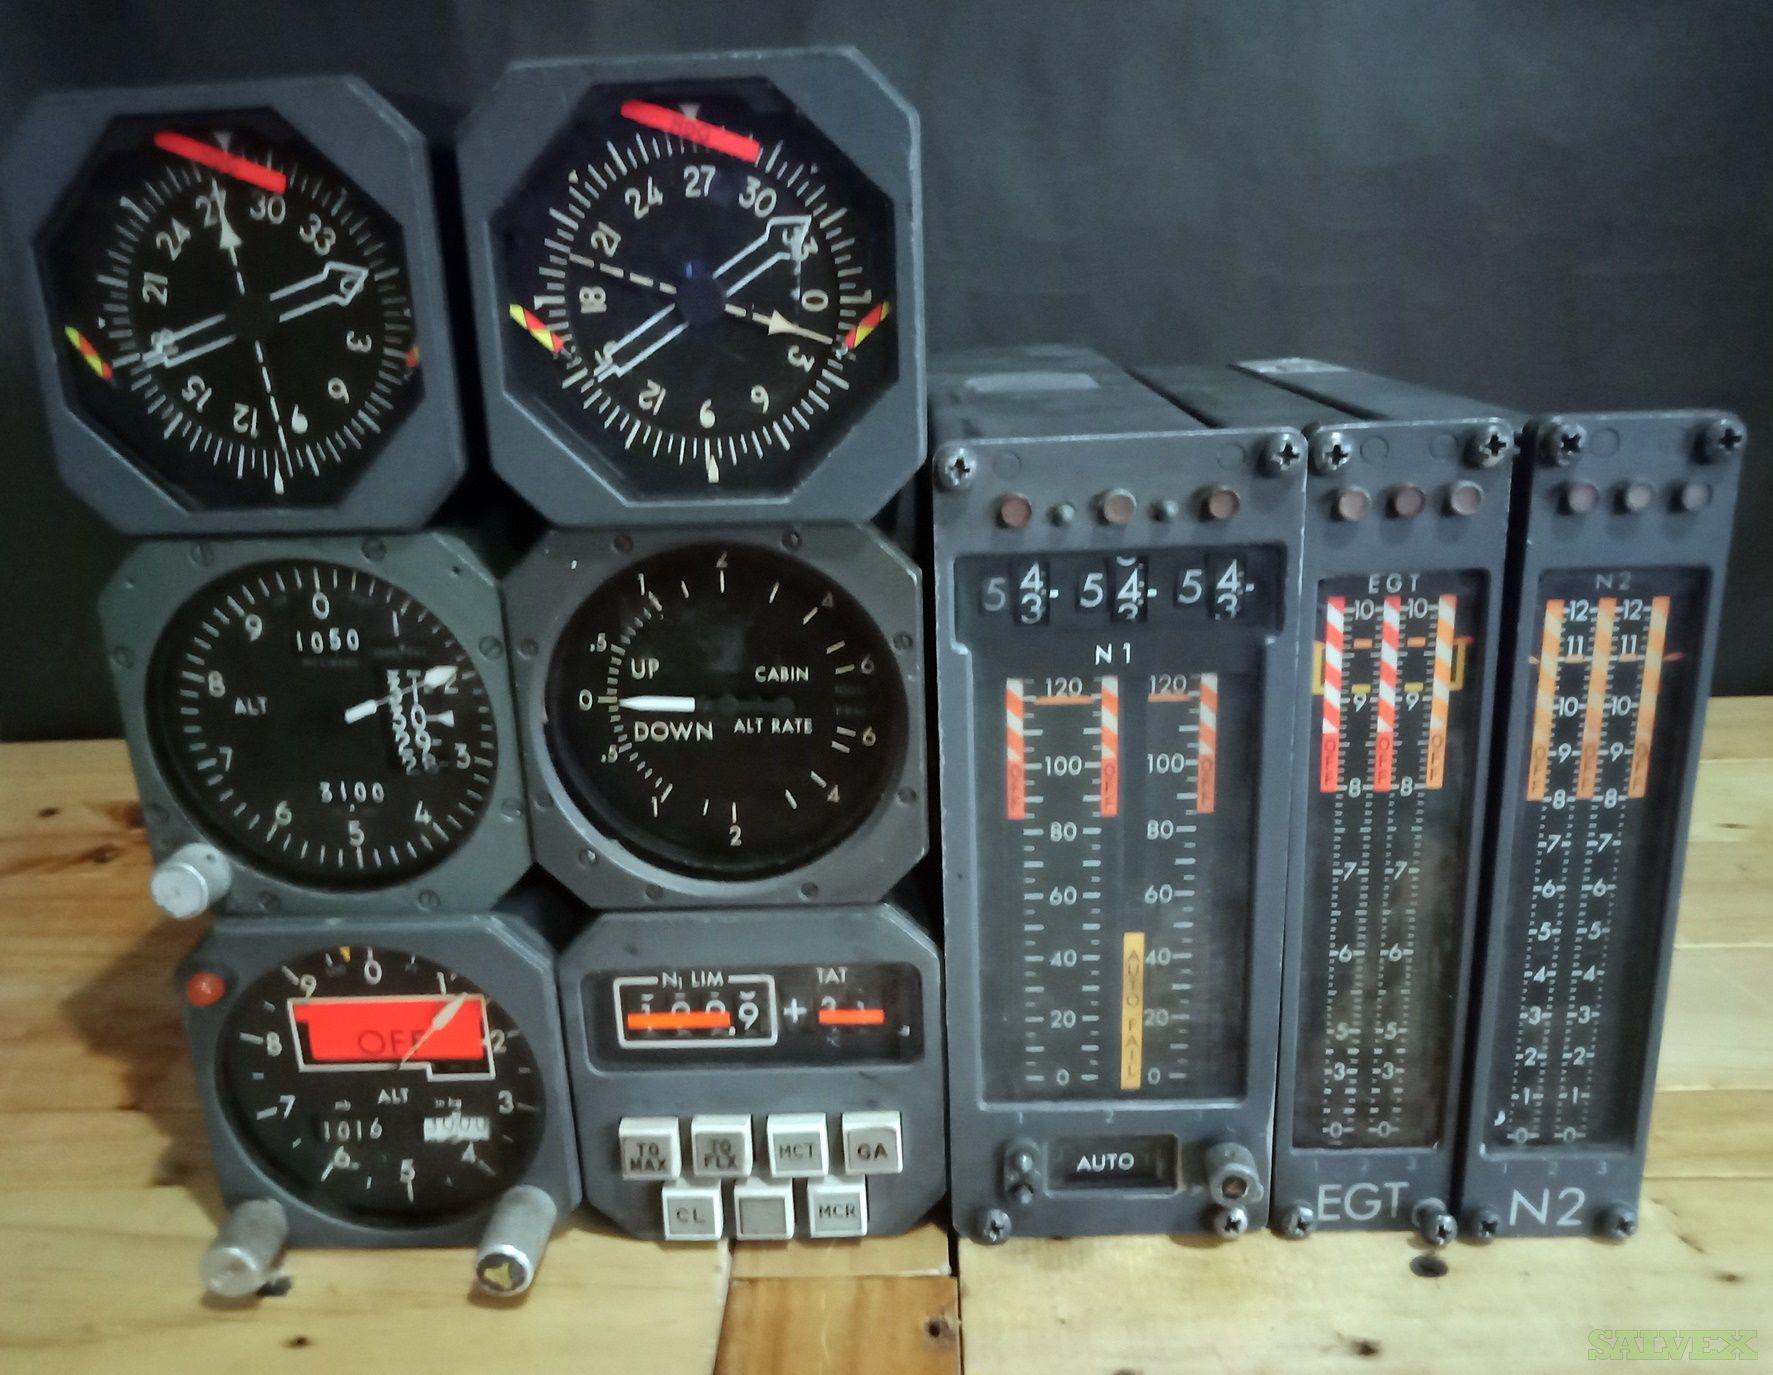 DC-10 RMI, EGT, N1, N2 Indicators and More (9 Units)